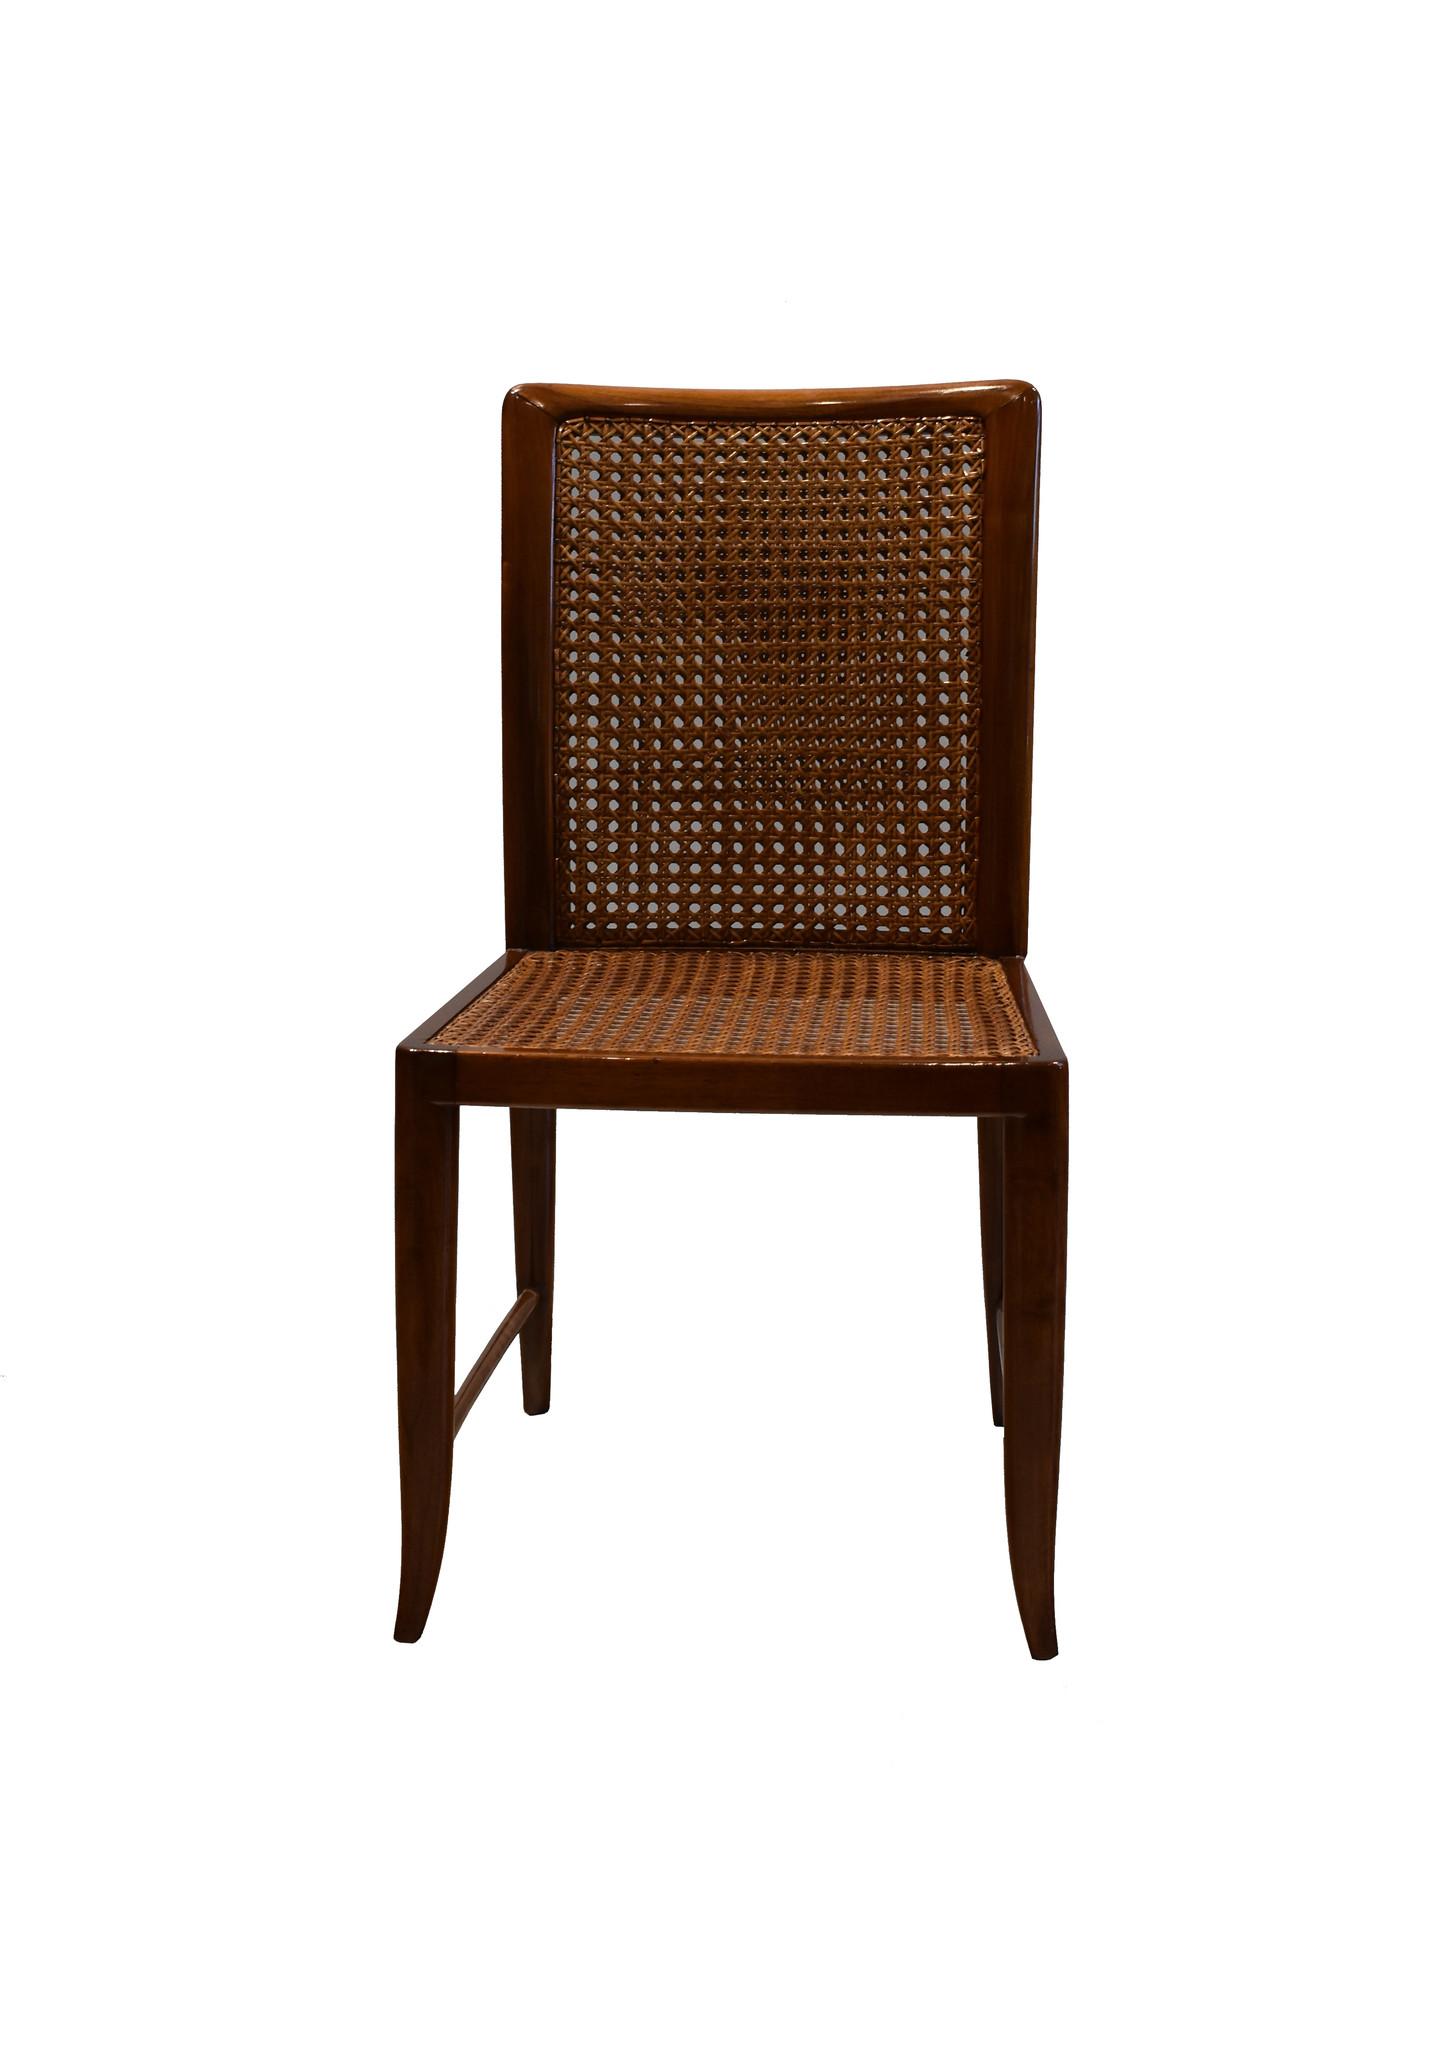 Paolo Buffa Paolo Buffa Chairs Double Caning